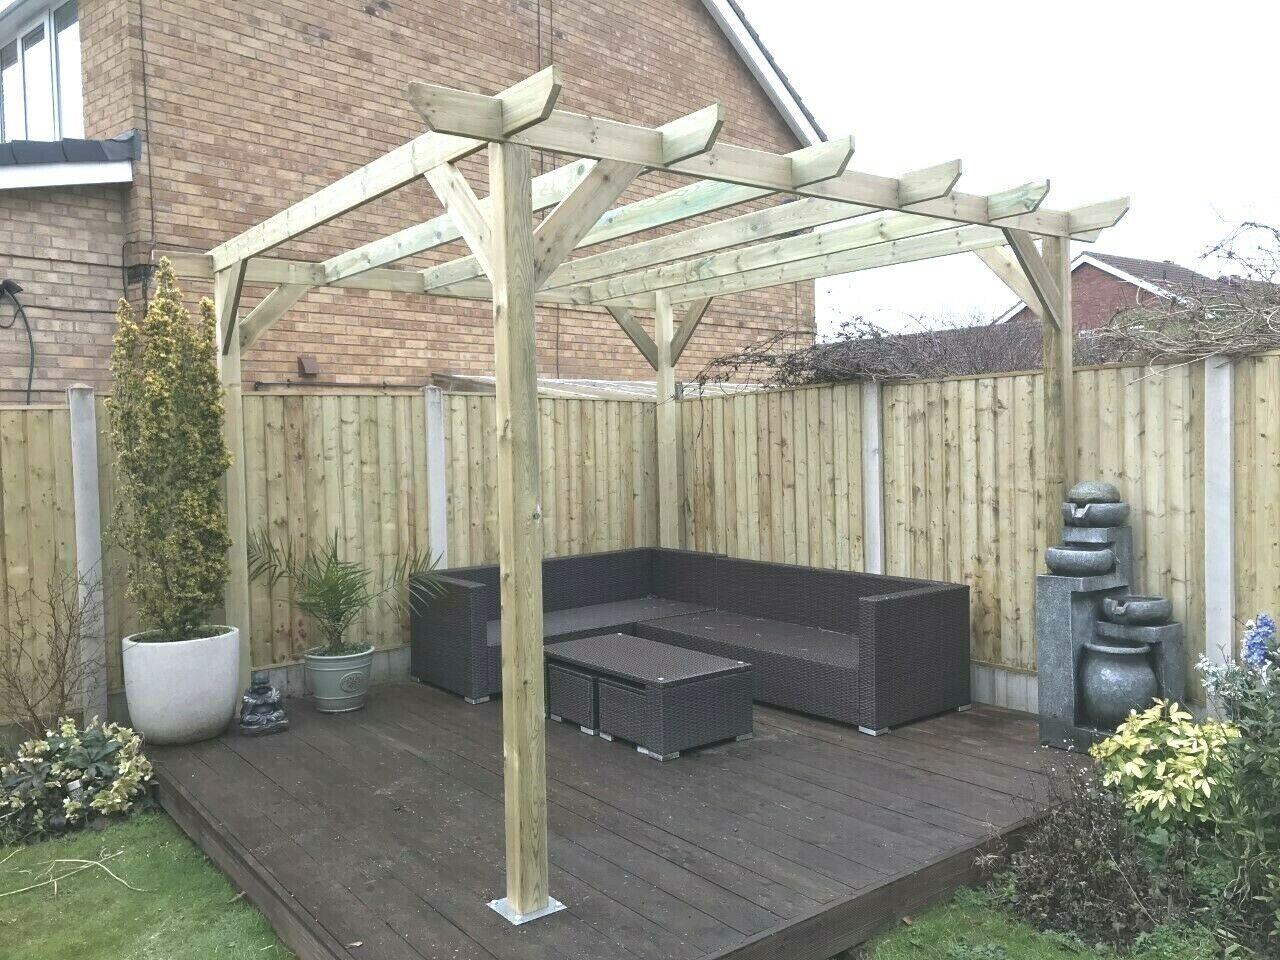 3m x 2 4m x 2 4m timber wooden garden gazebo pergola lean to lean to